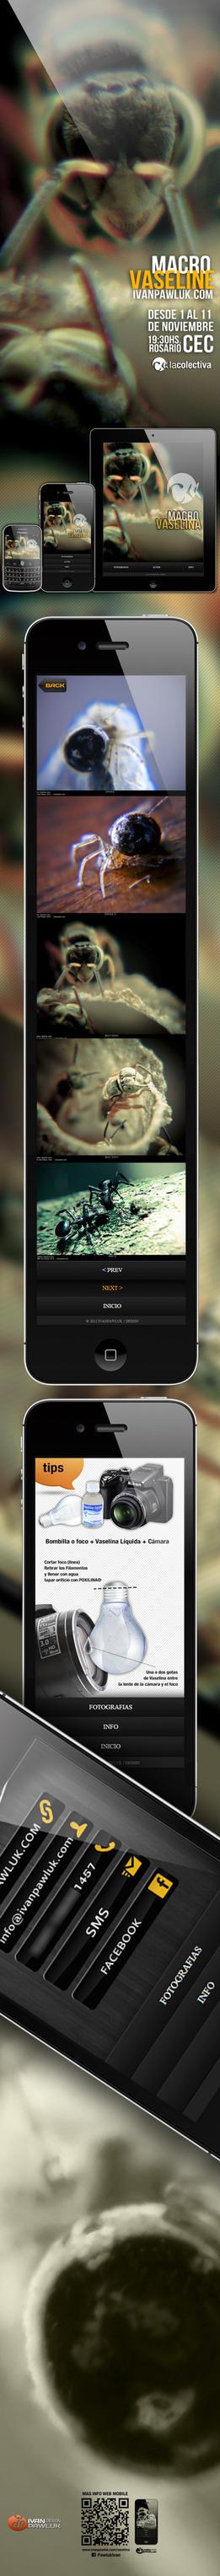 apps Vaseline Macro by ipawluk